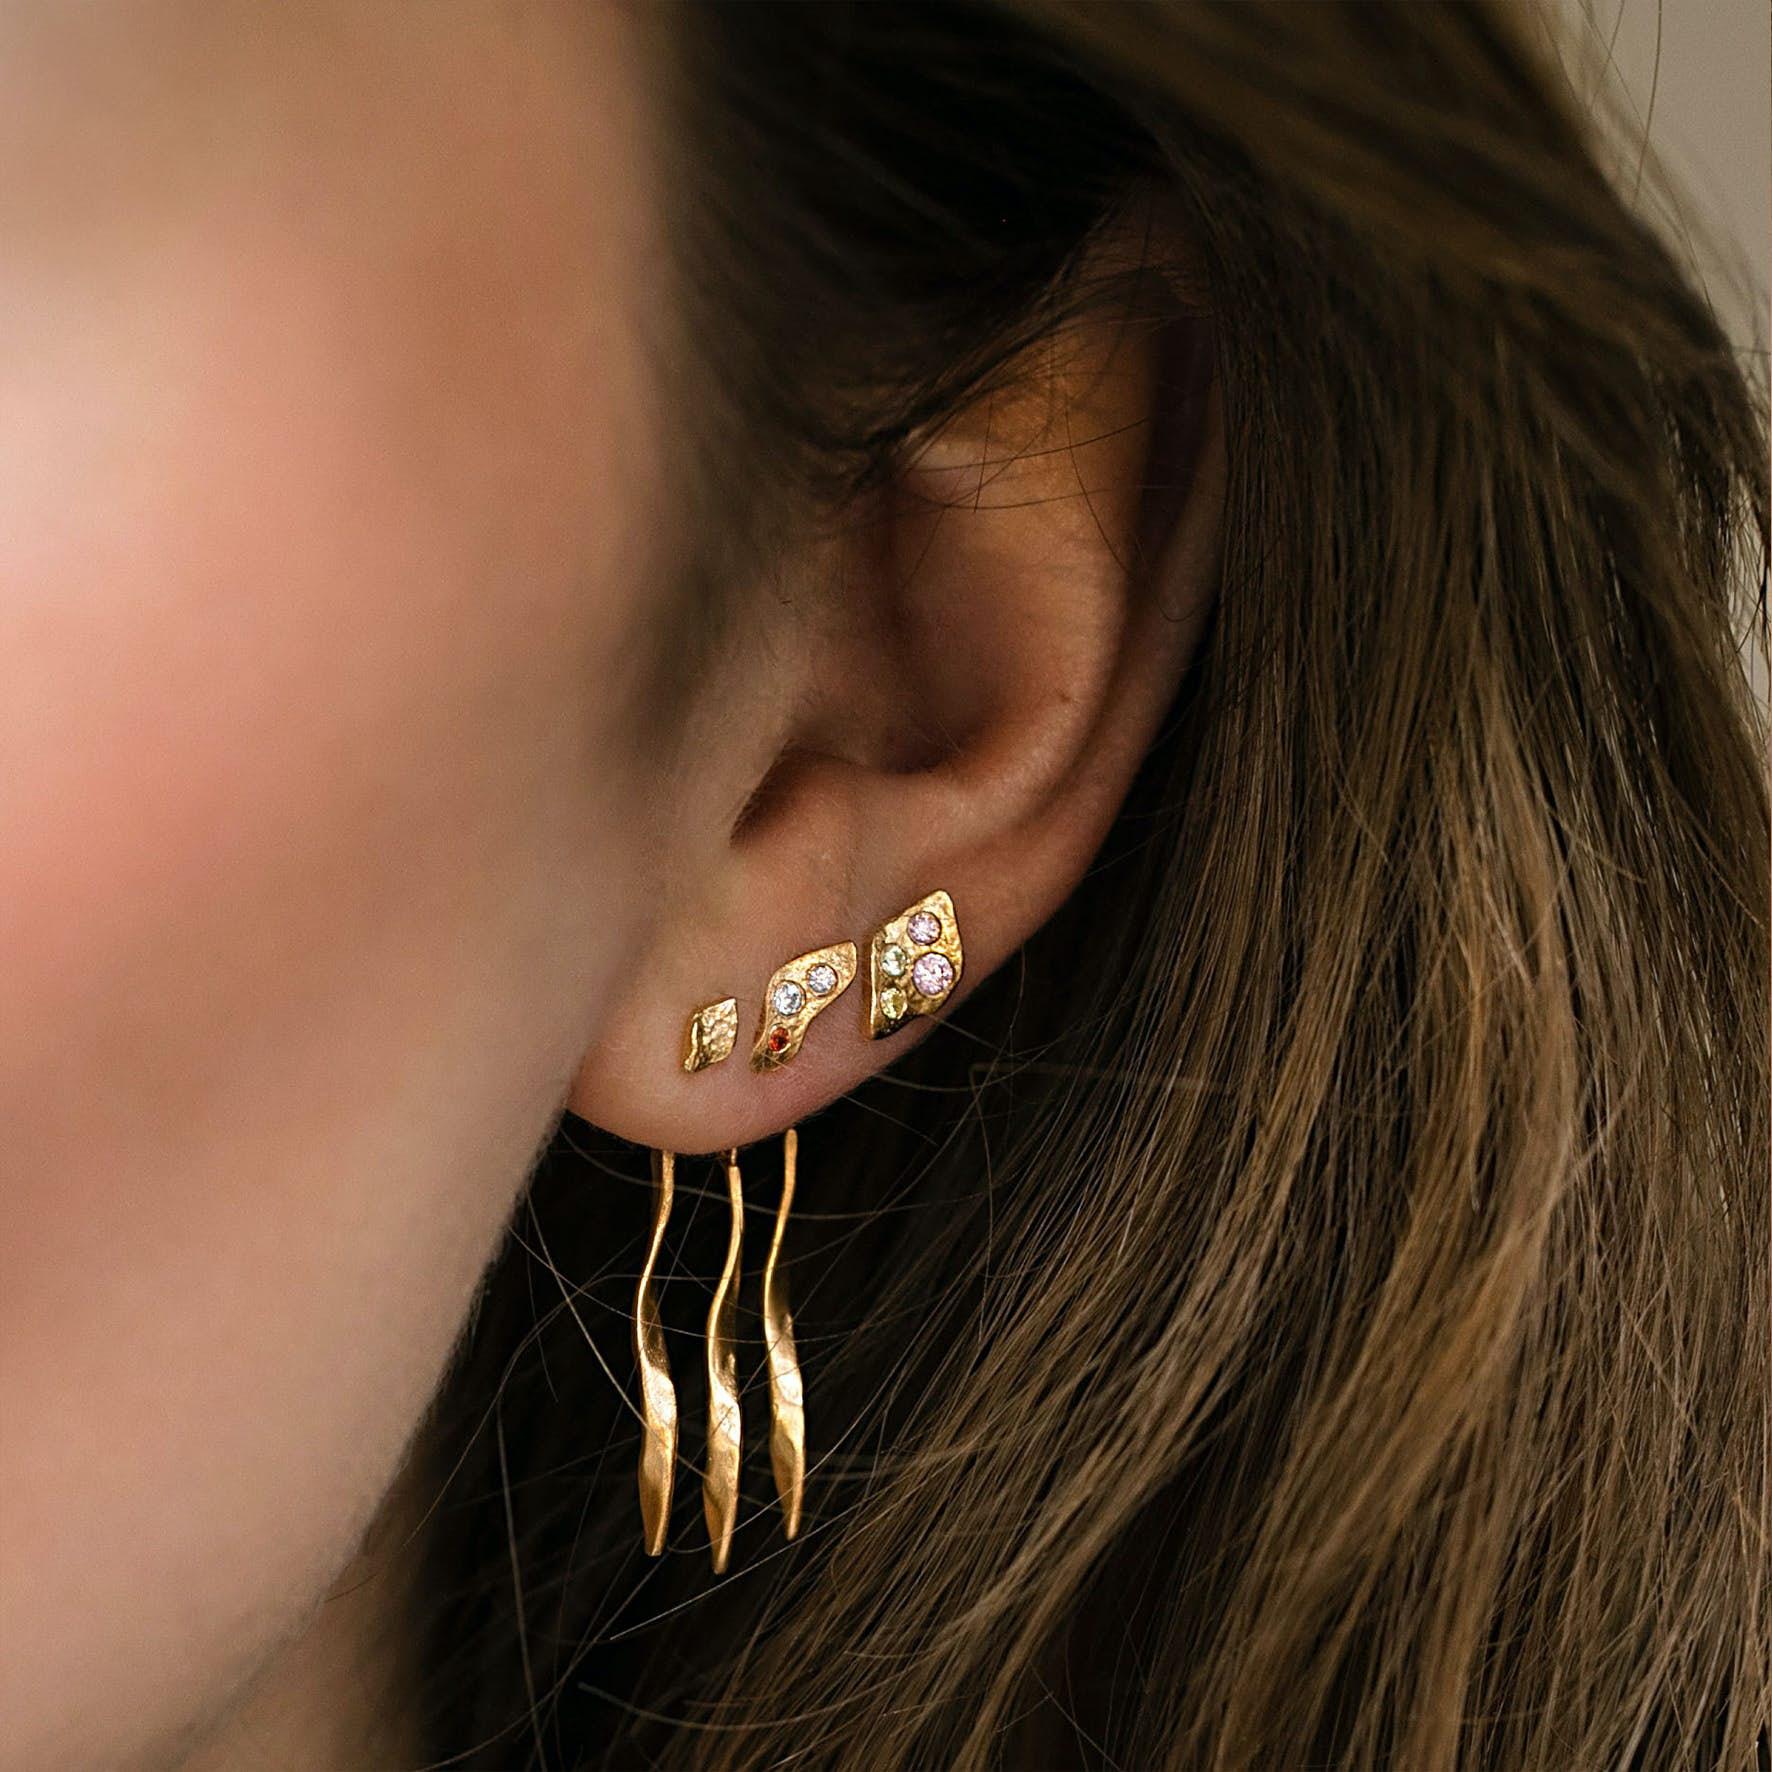 Tout Petit Ile De L'Amour Earstick von STINE A Jewelry in Vergoldet-Silber Sterling 925